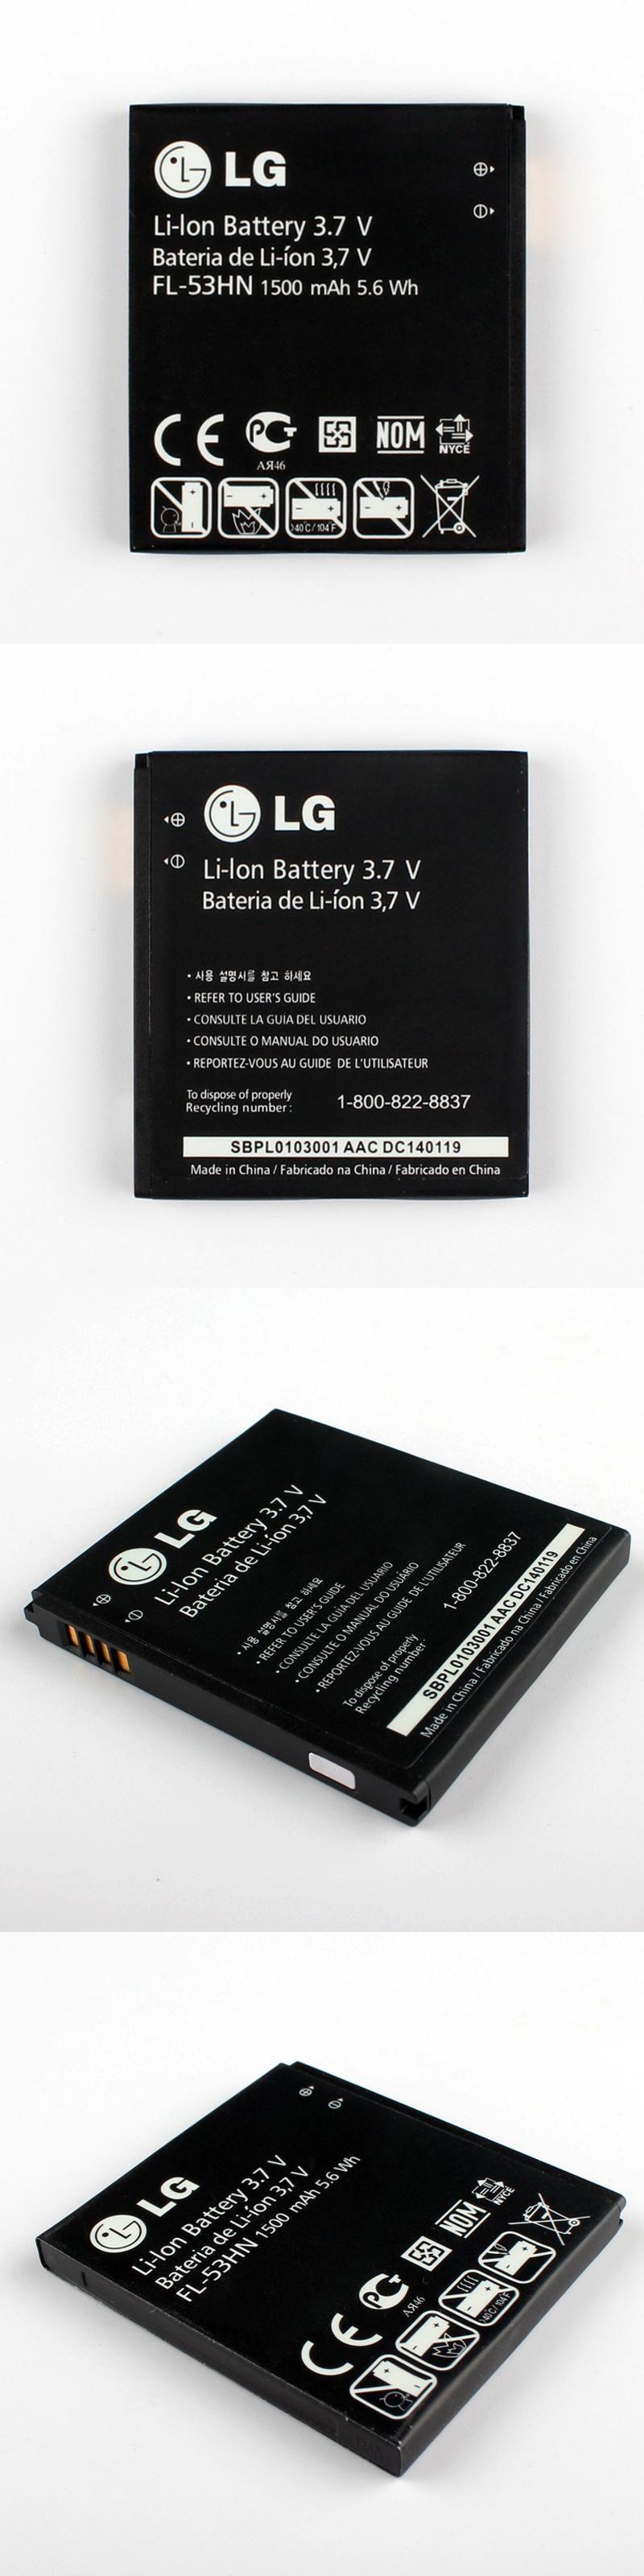 new original lg fl 53hn battery for lg optimus 2x p990 p993 p920 rh pinterest co uk Manual De Usuario Samsung Manual De Usuario Windows 8